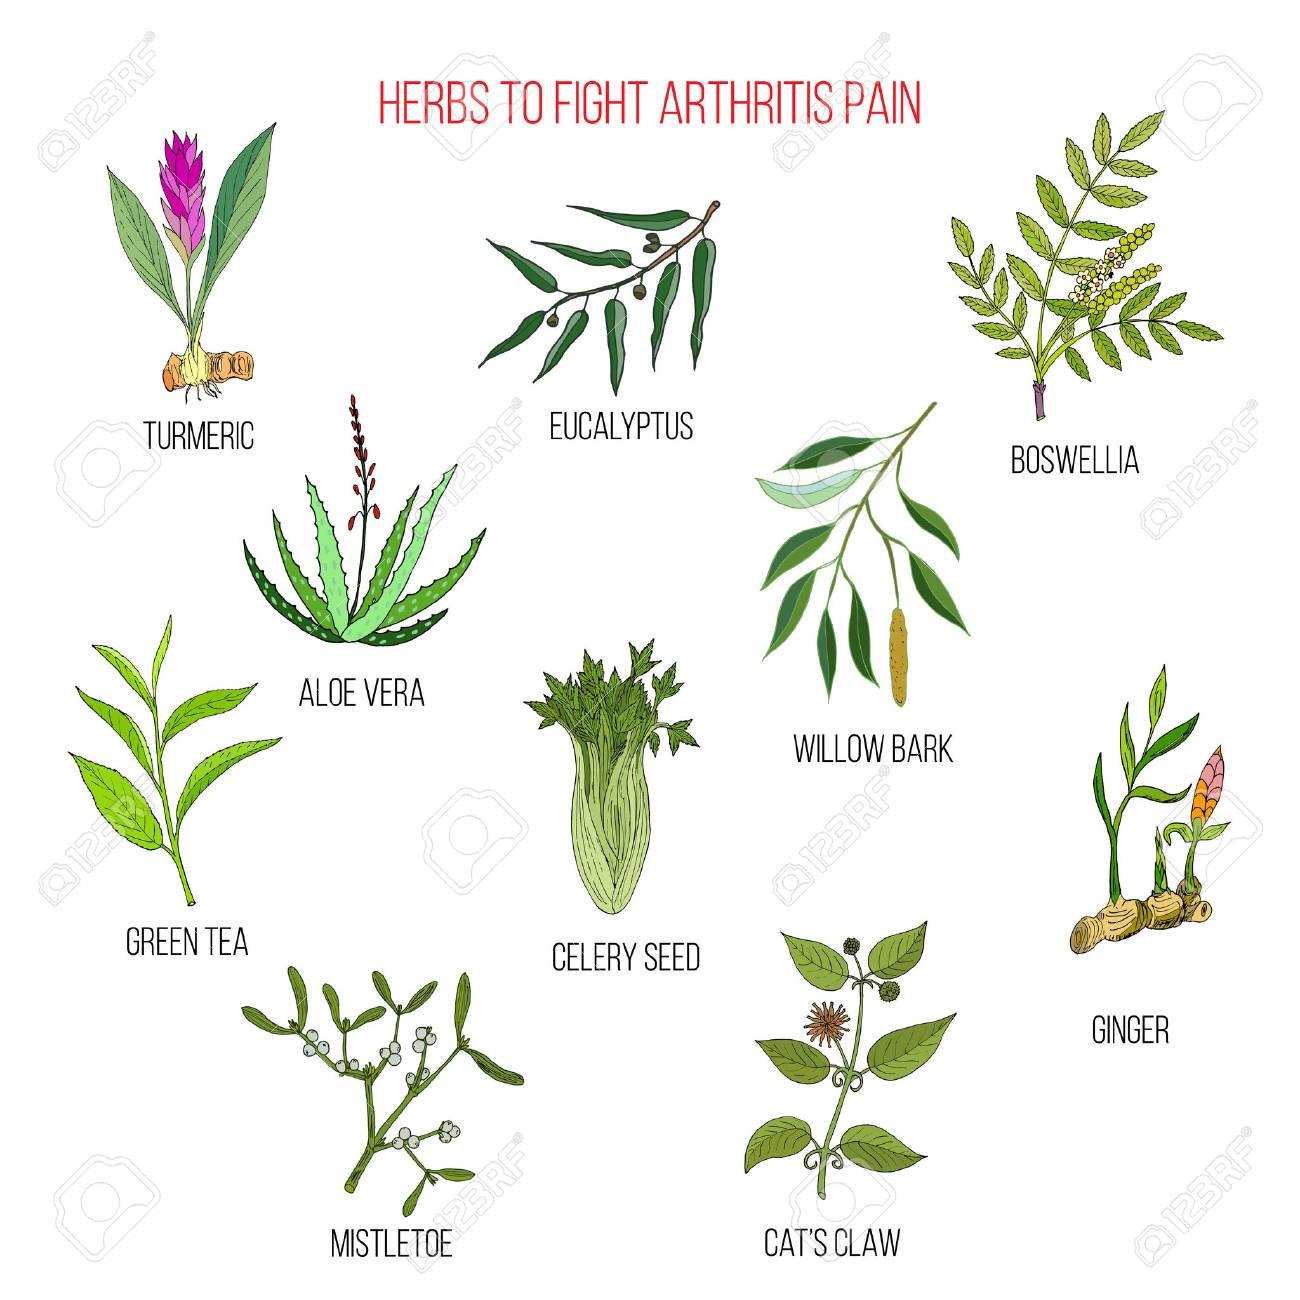 Herbs To Fight Arthritis Pain Turmeric Eucalyptus Boswellia Aloe Vera Willow